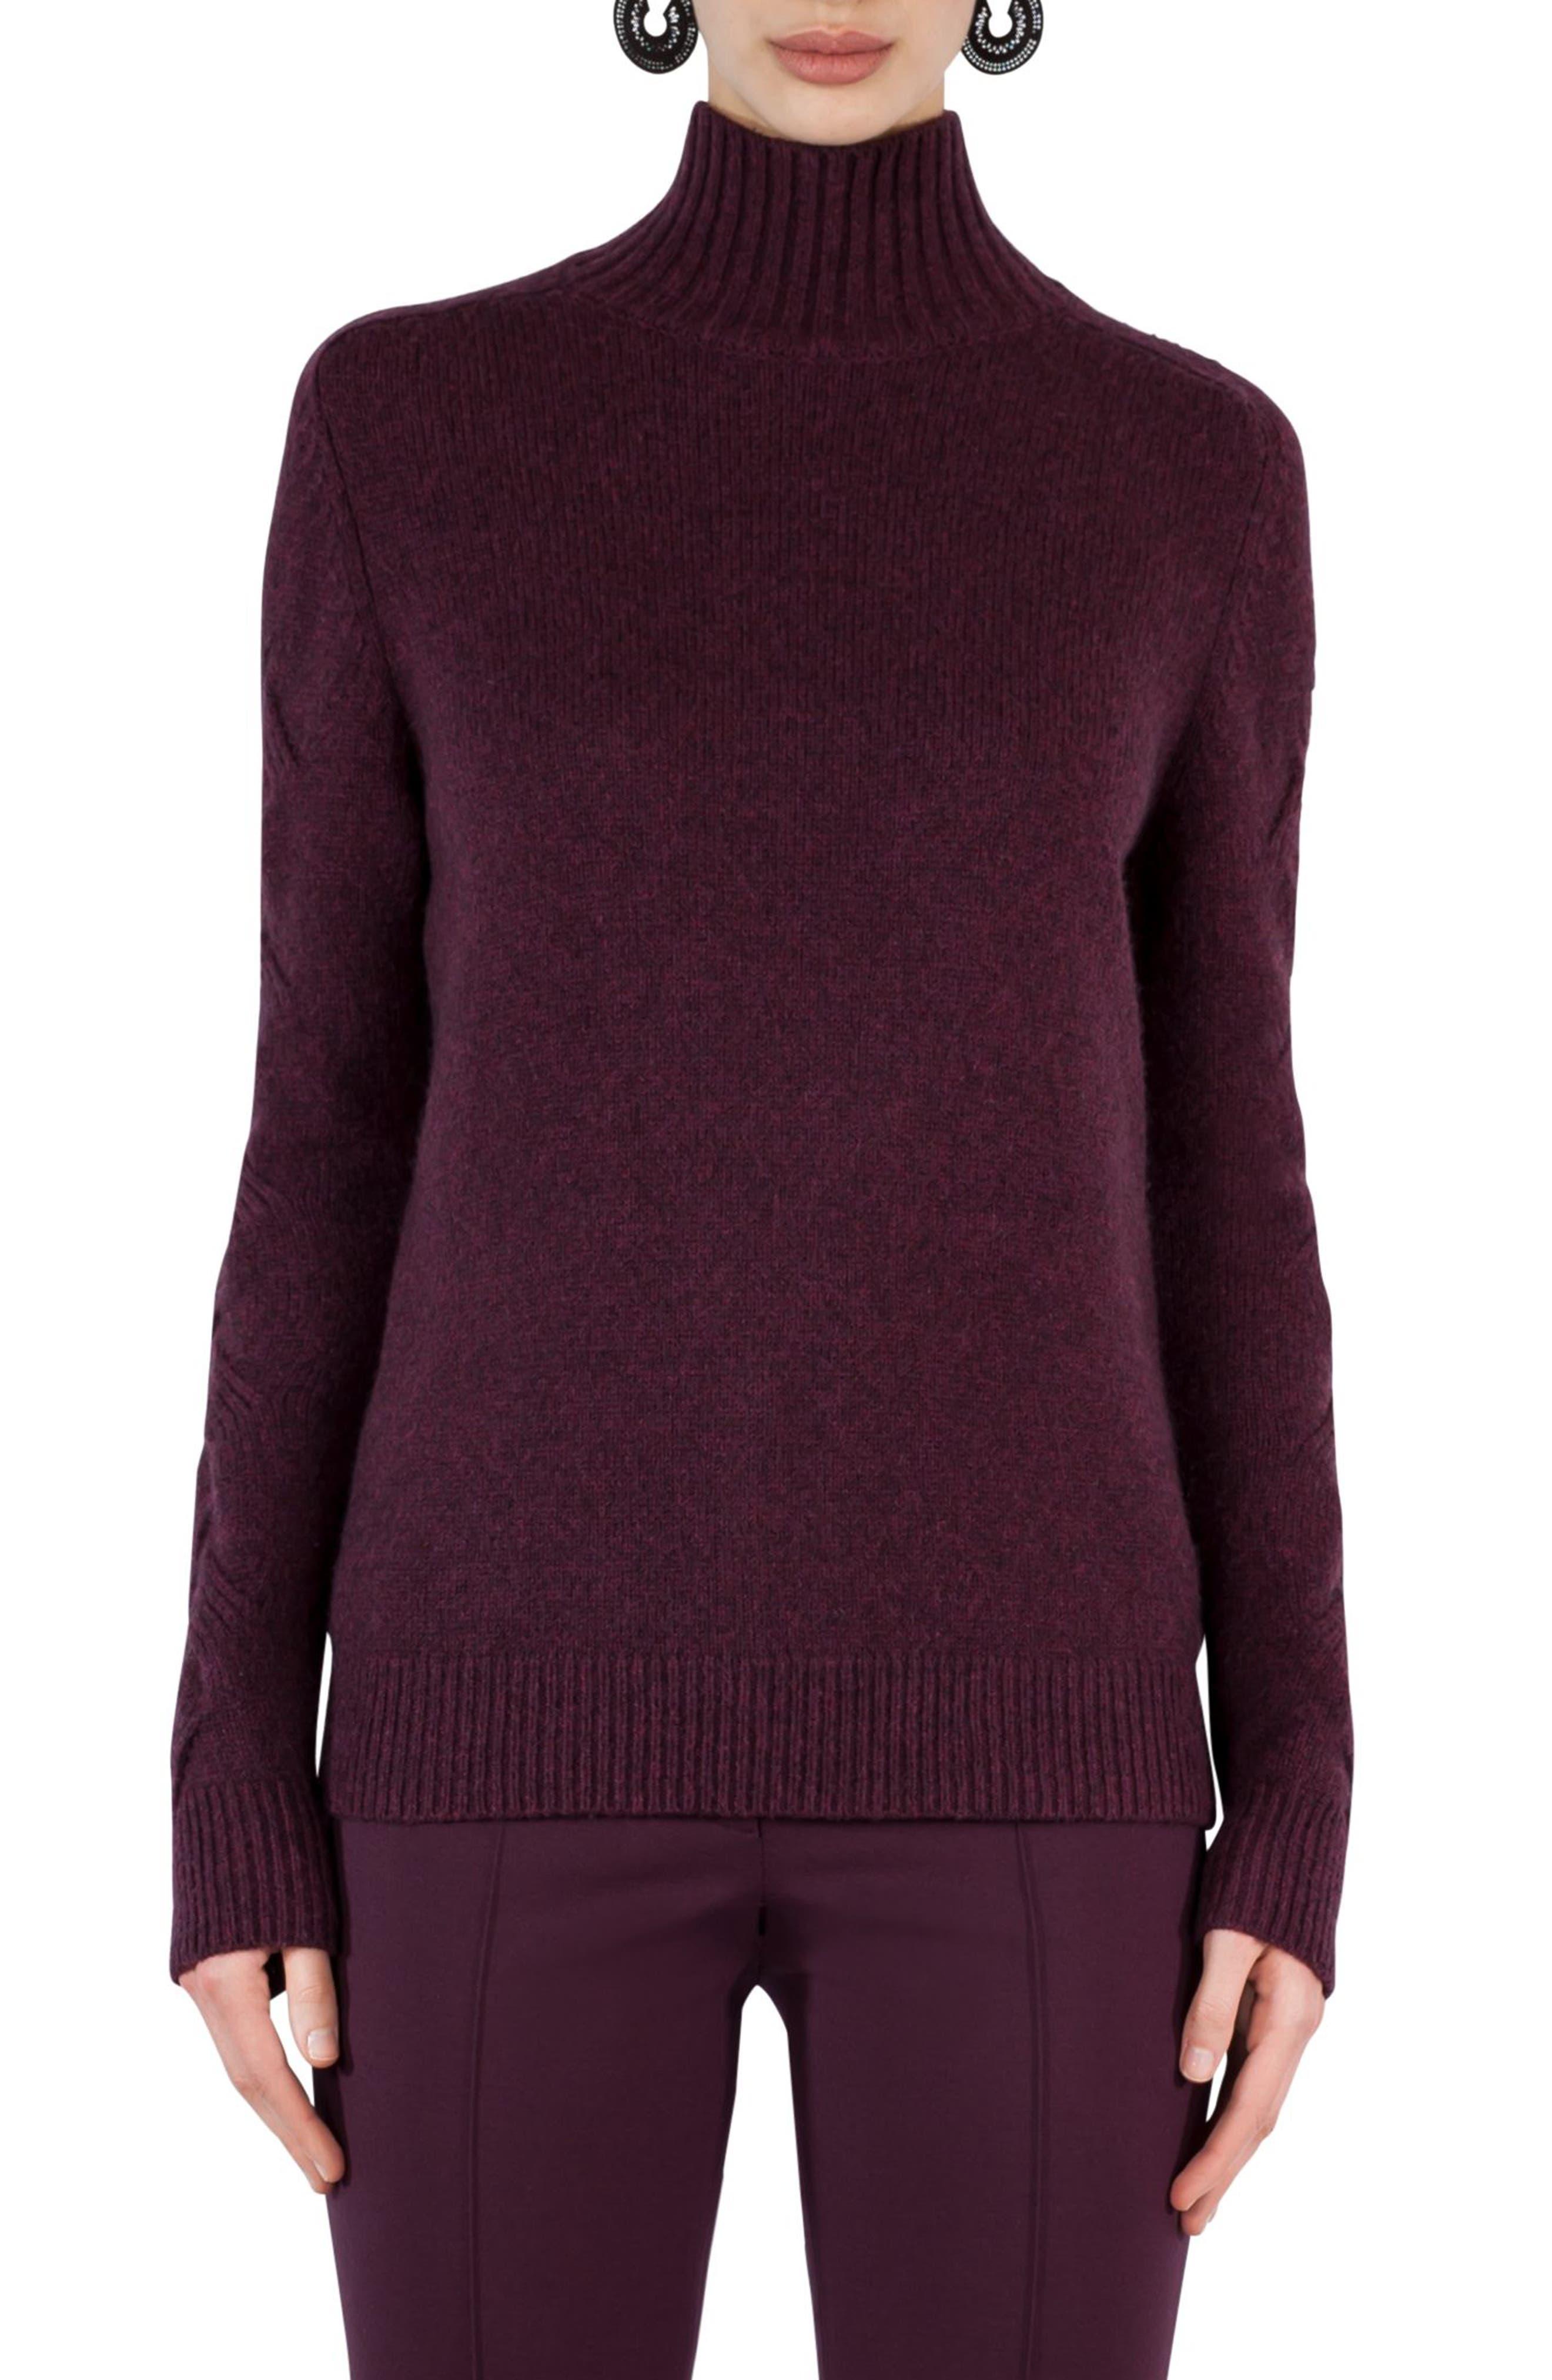 Wool Blend Turtleneck Sweater,                         Main,                         color, Wine